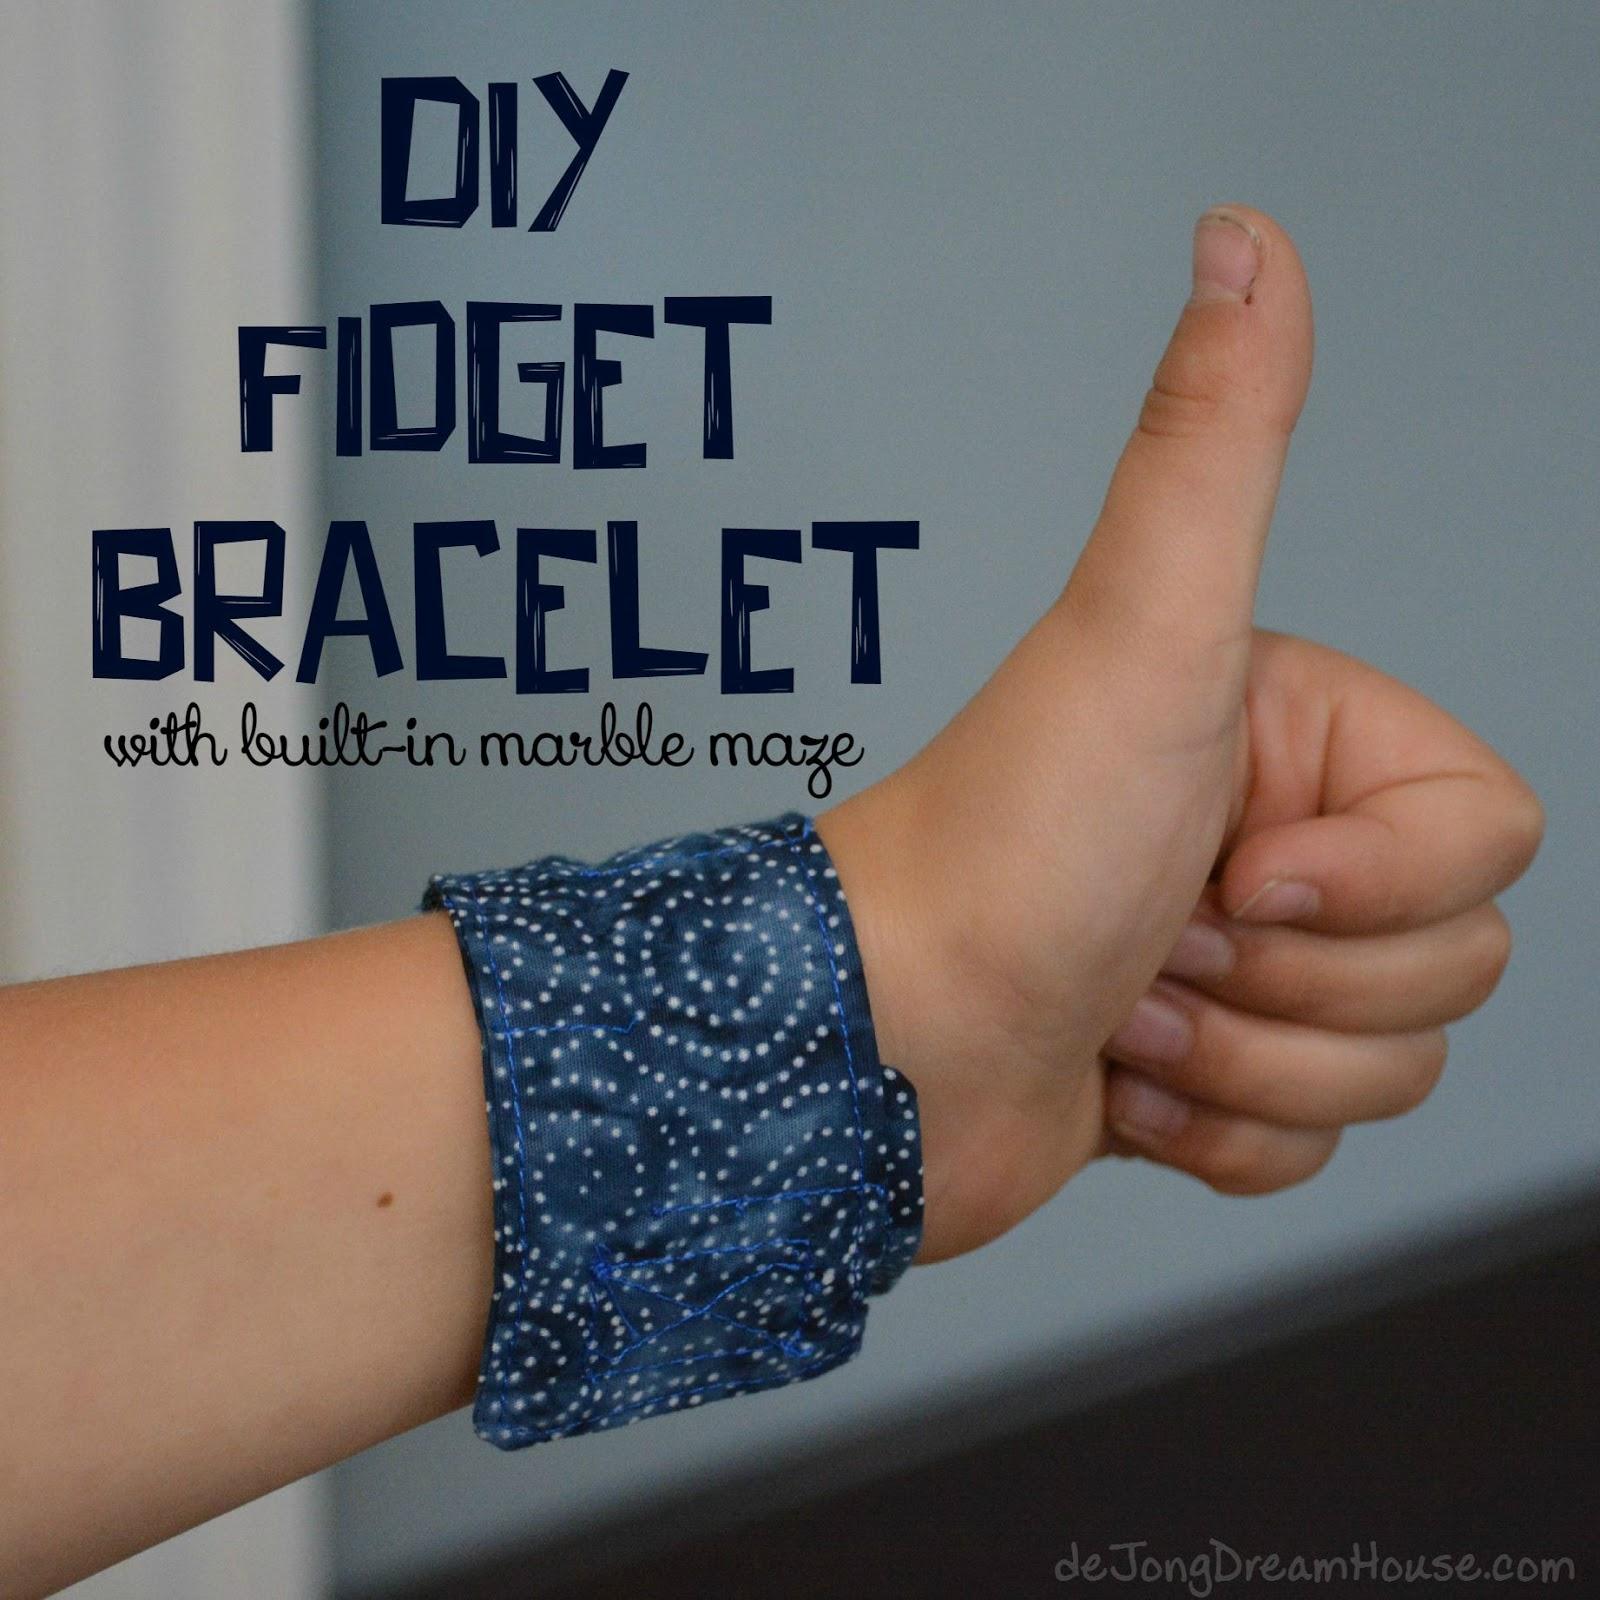 De Jong Dream House Diy Fidget Bracelet With Built In